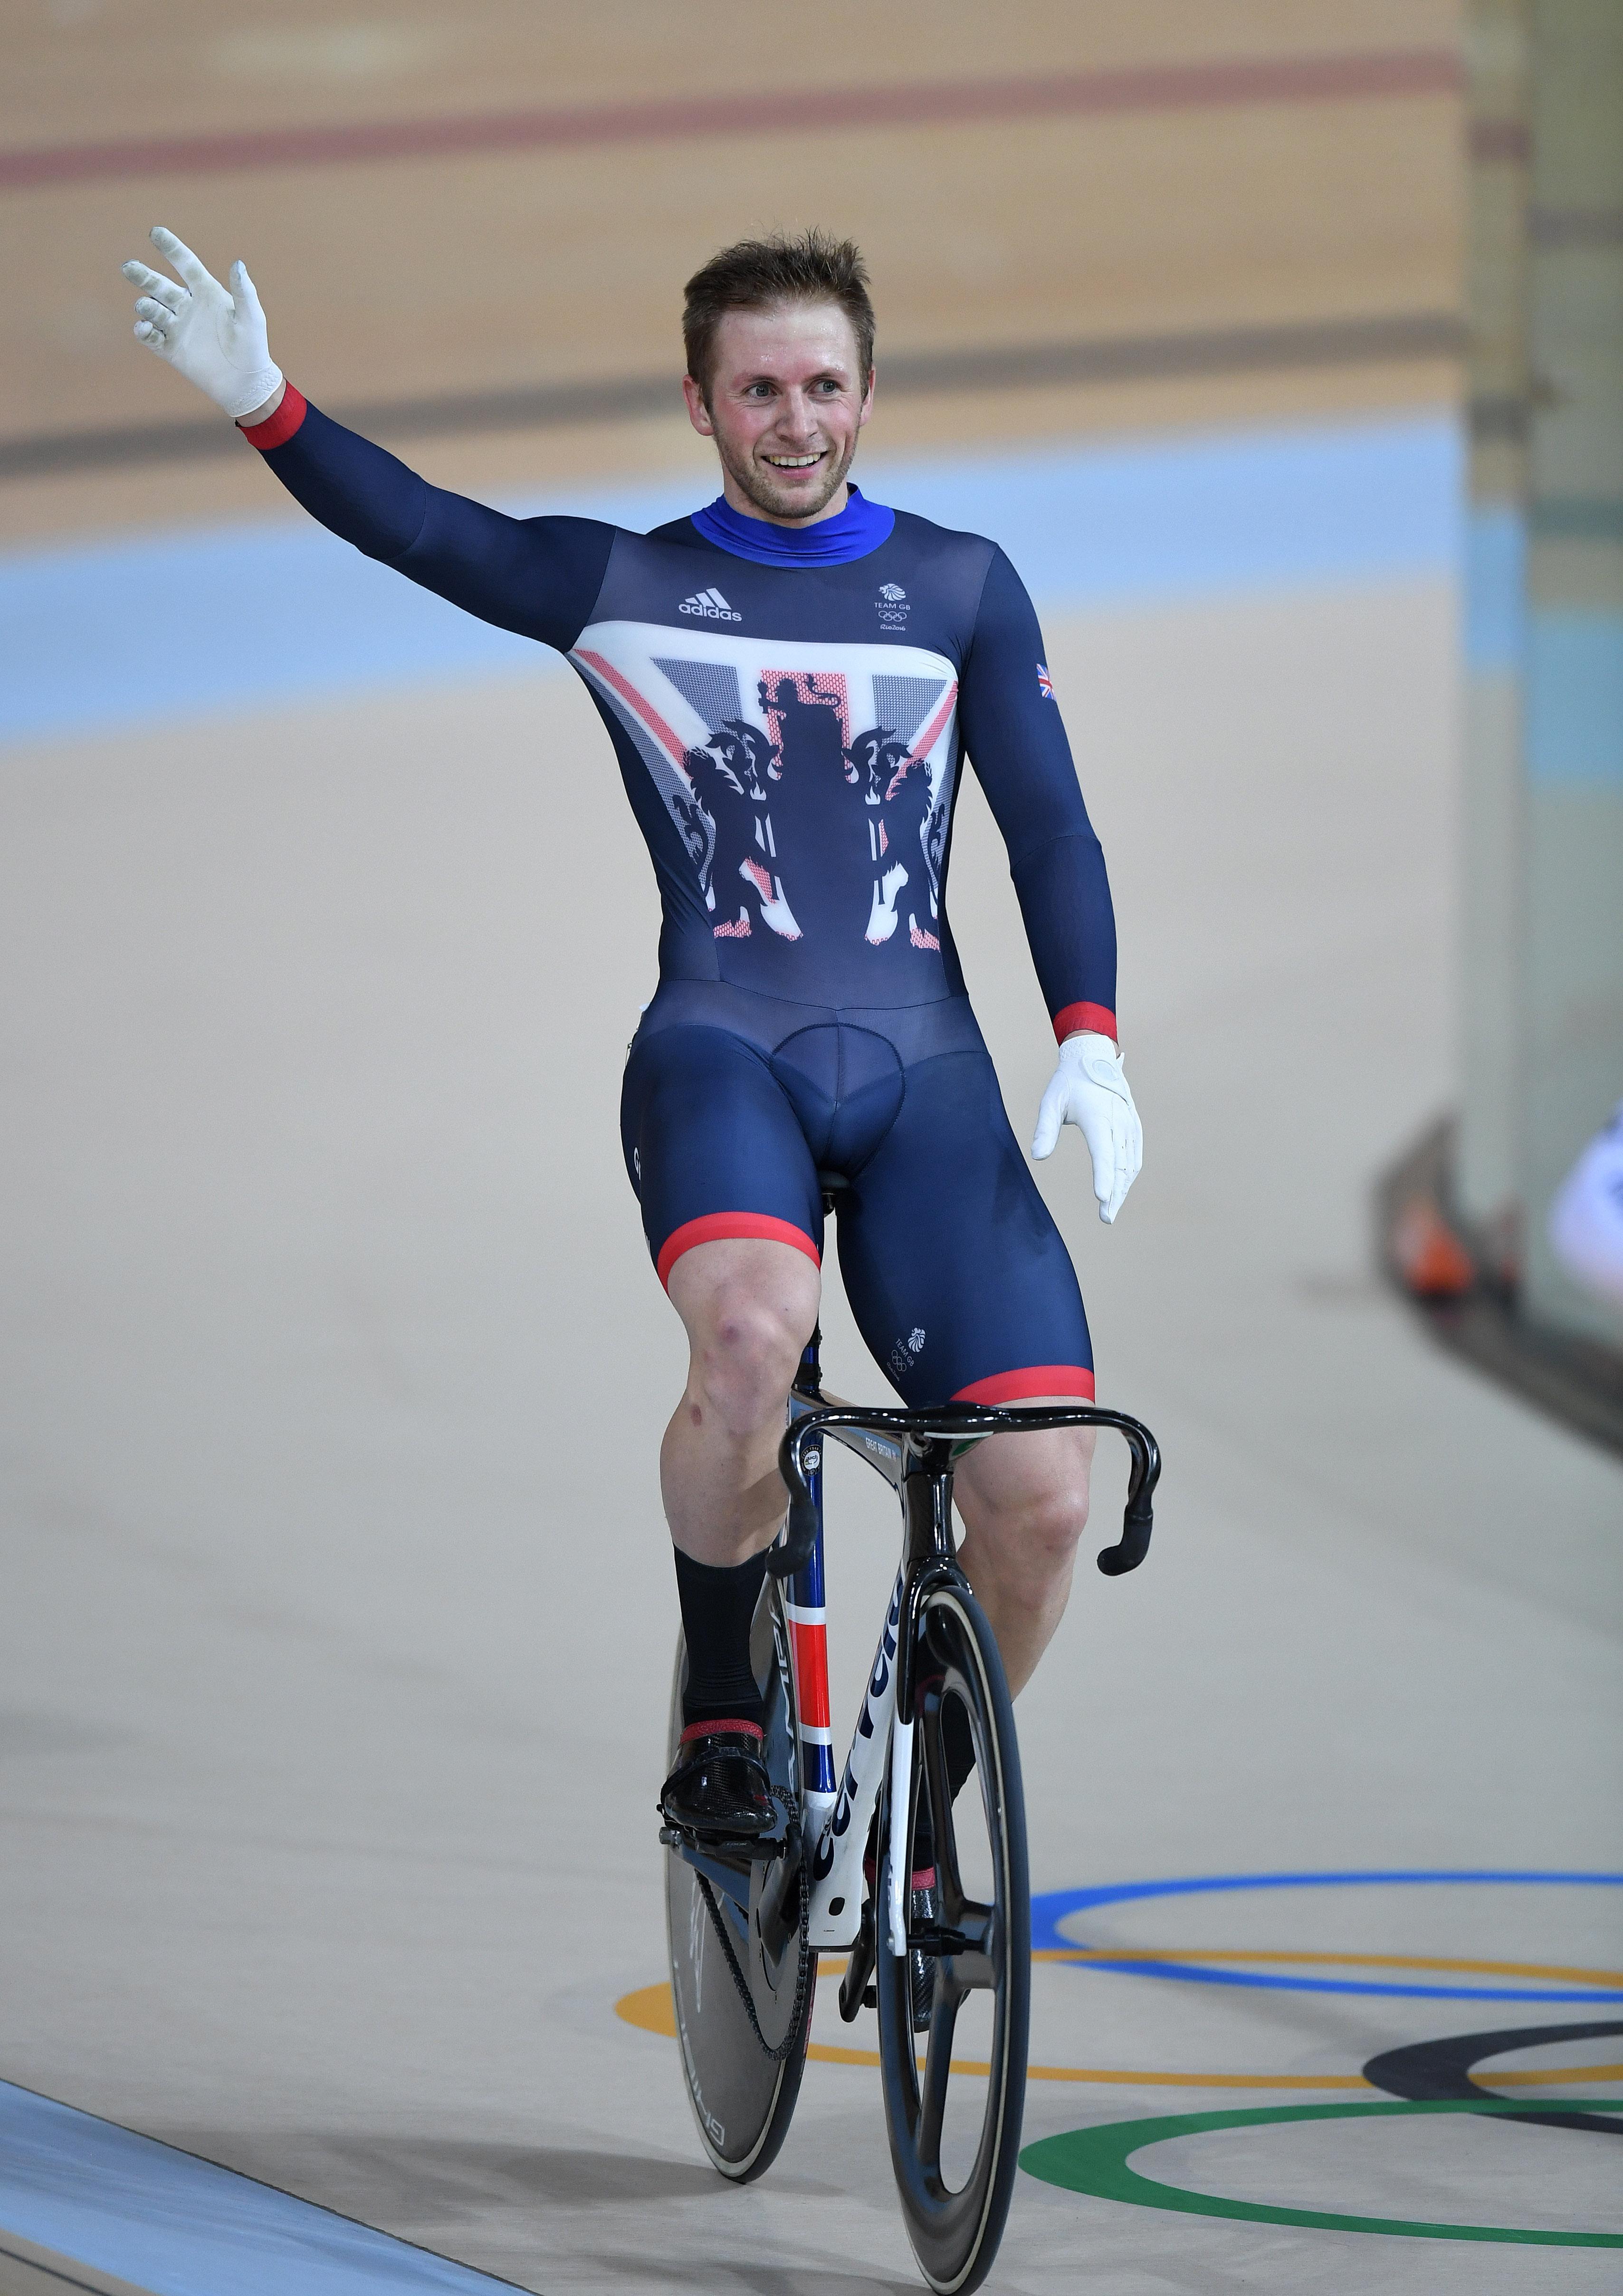 Jason Kenny winning gold in the Men's Keirin at Rio 2016